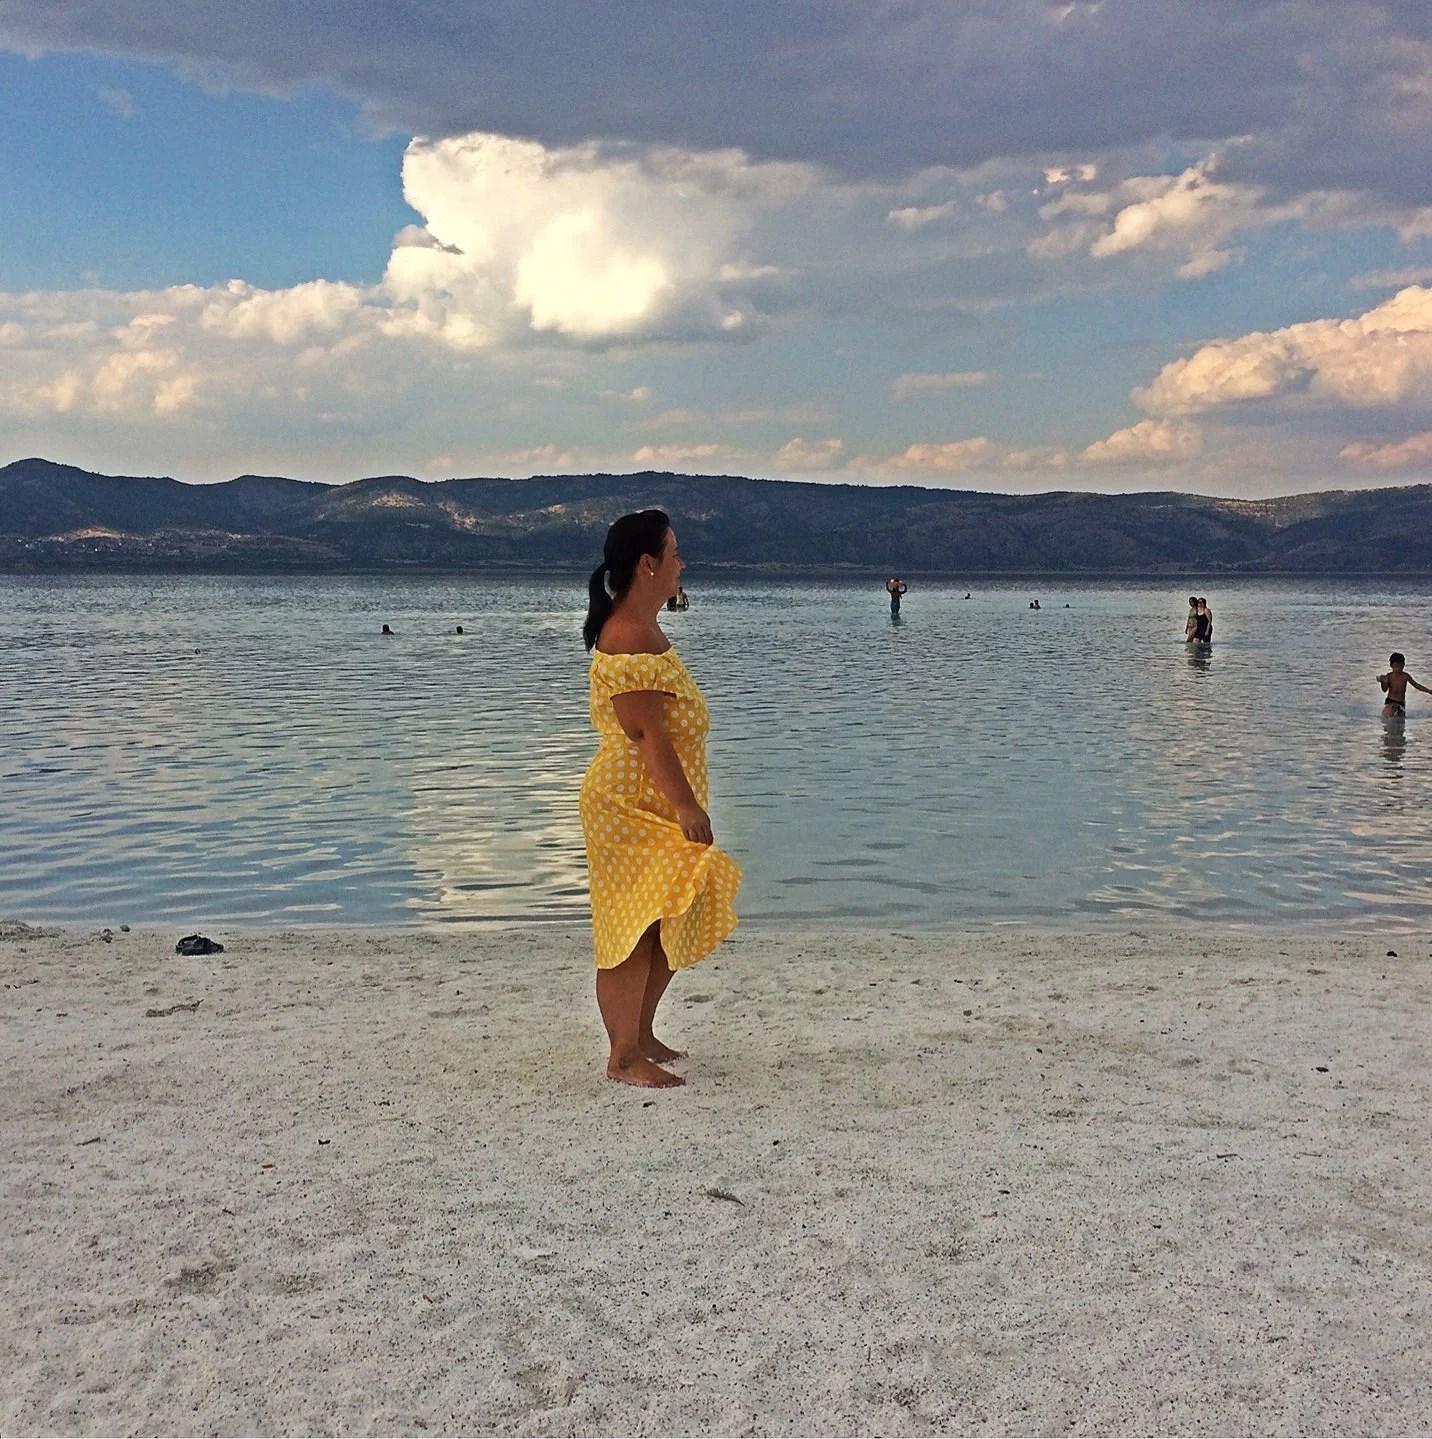 The white beach at Lake Salda